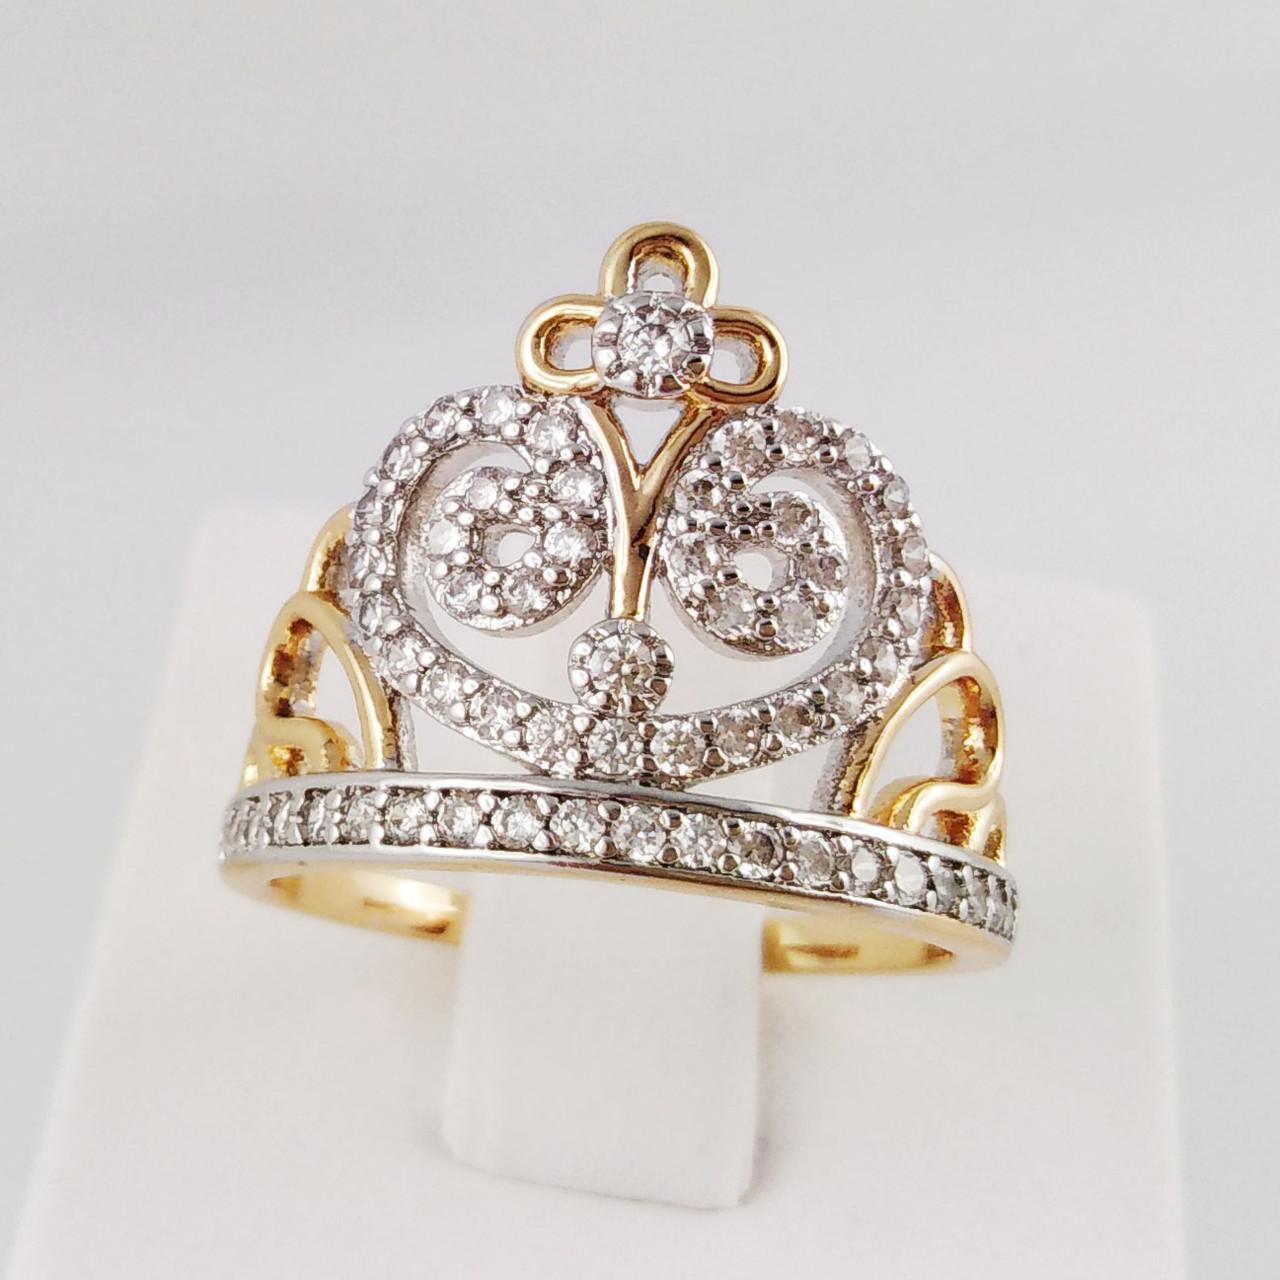 "Кольцо Xuping Jewelry  ""Корона для леди"" размер 19, медицинское золото, позолота 18К + родий. А/В 1974"